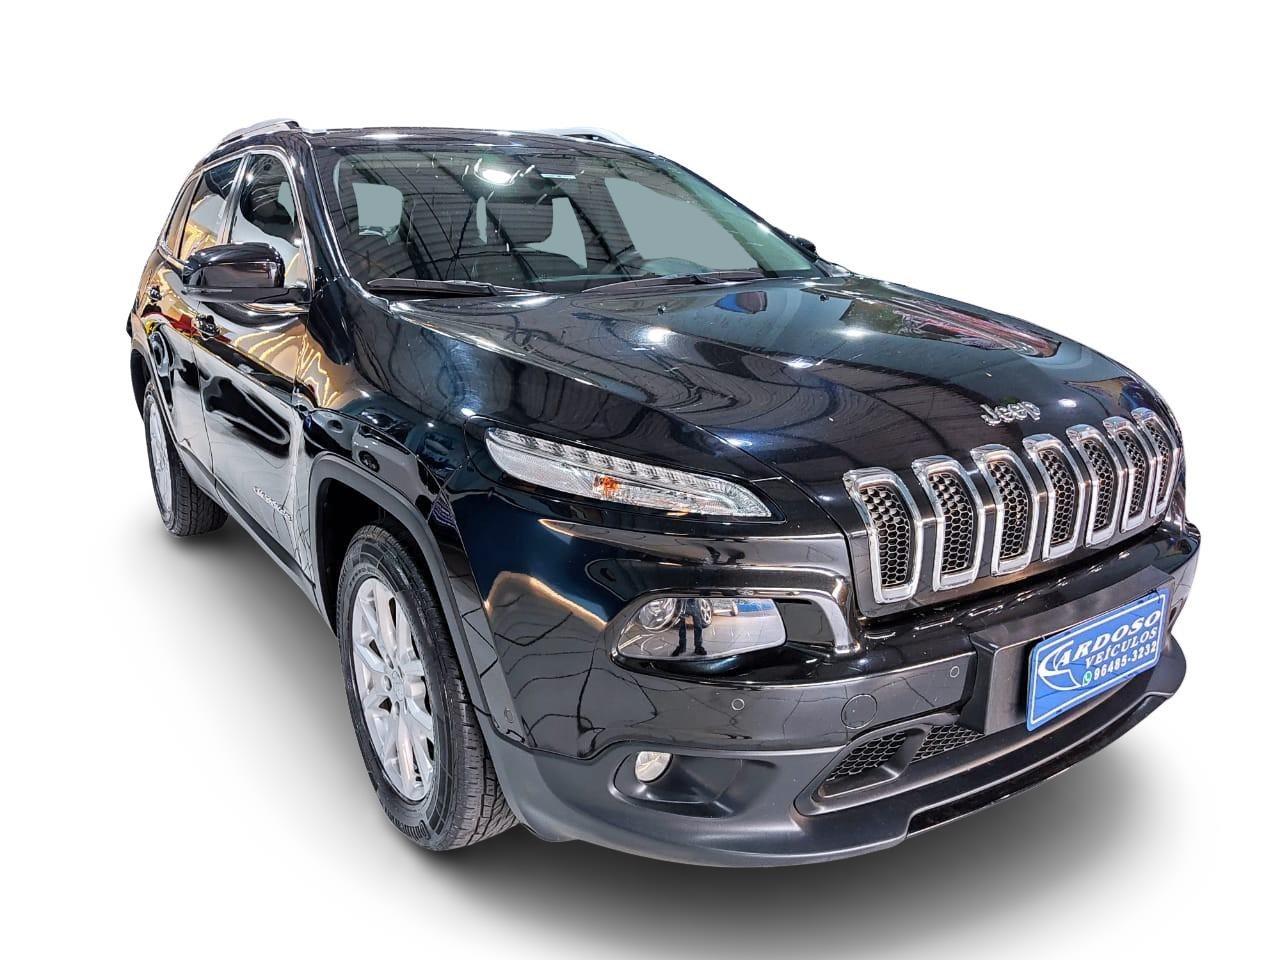 //www.autoline.com.br/carro/jeep/cherokee-32-v6-longitude-24v-gasolina-4p-4x4-automatic/2015/carapicuiba-sp/14951113